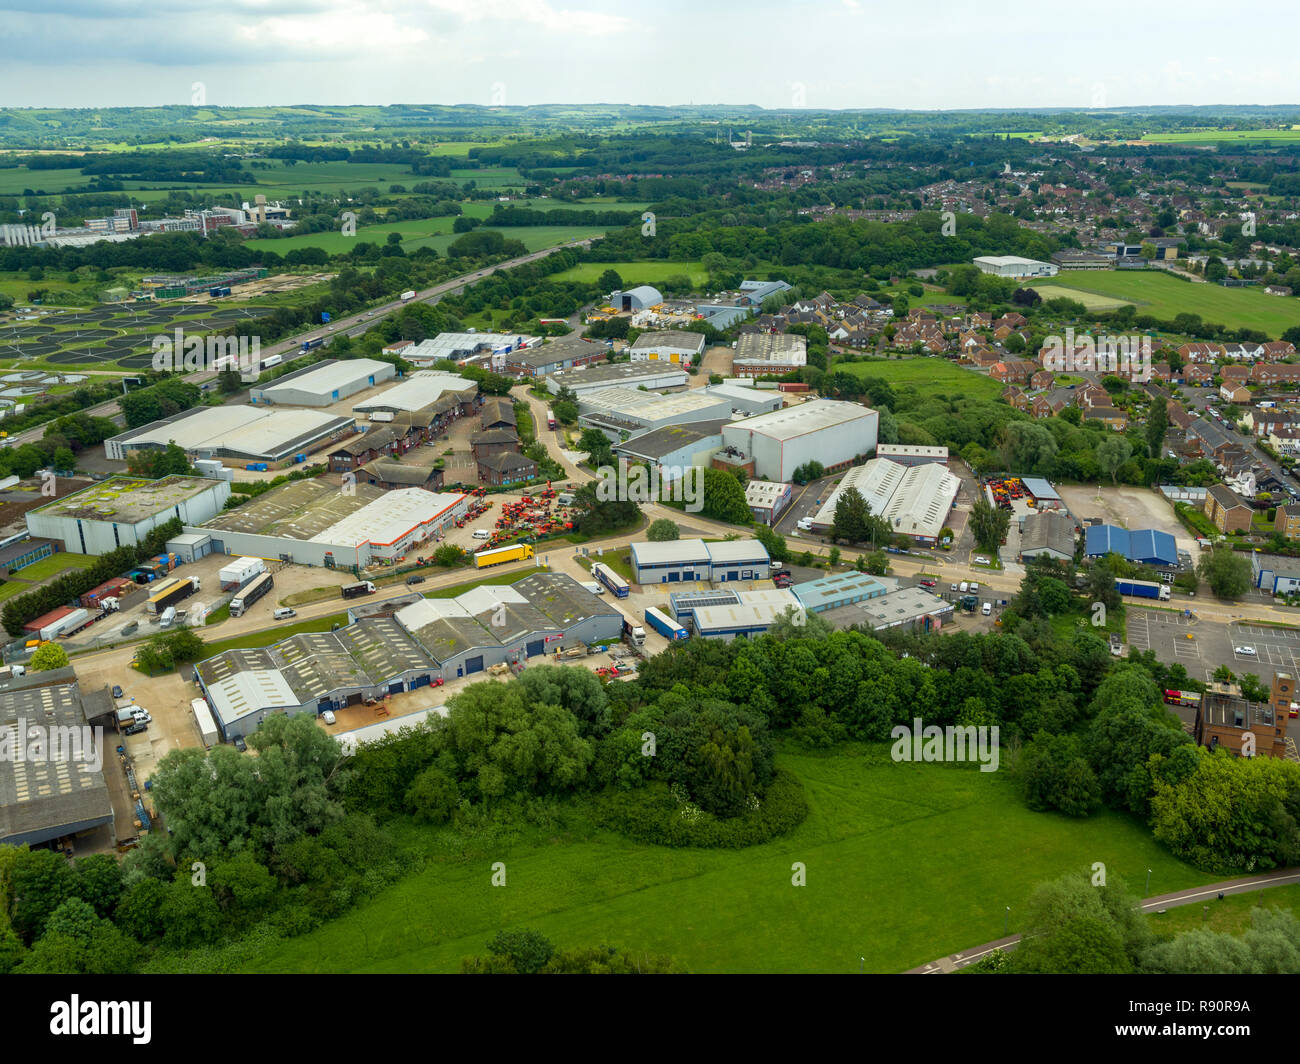 Aerial view of Henwood industrial estate, Ashford, Kent, UK - Stock Image